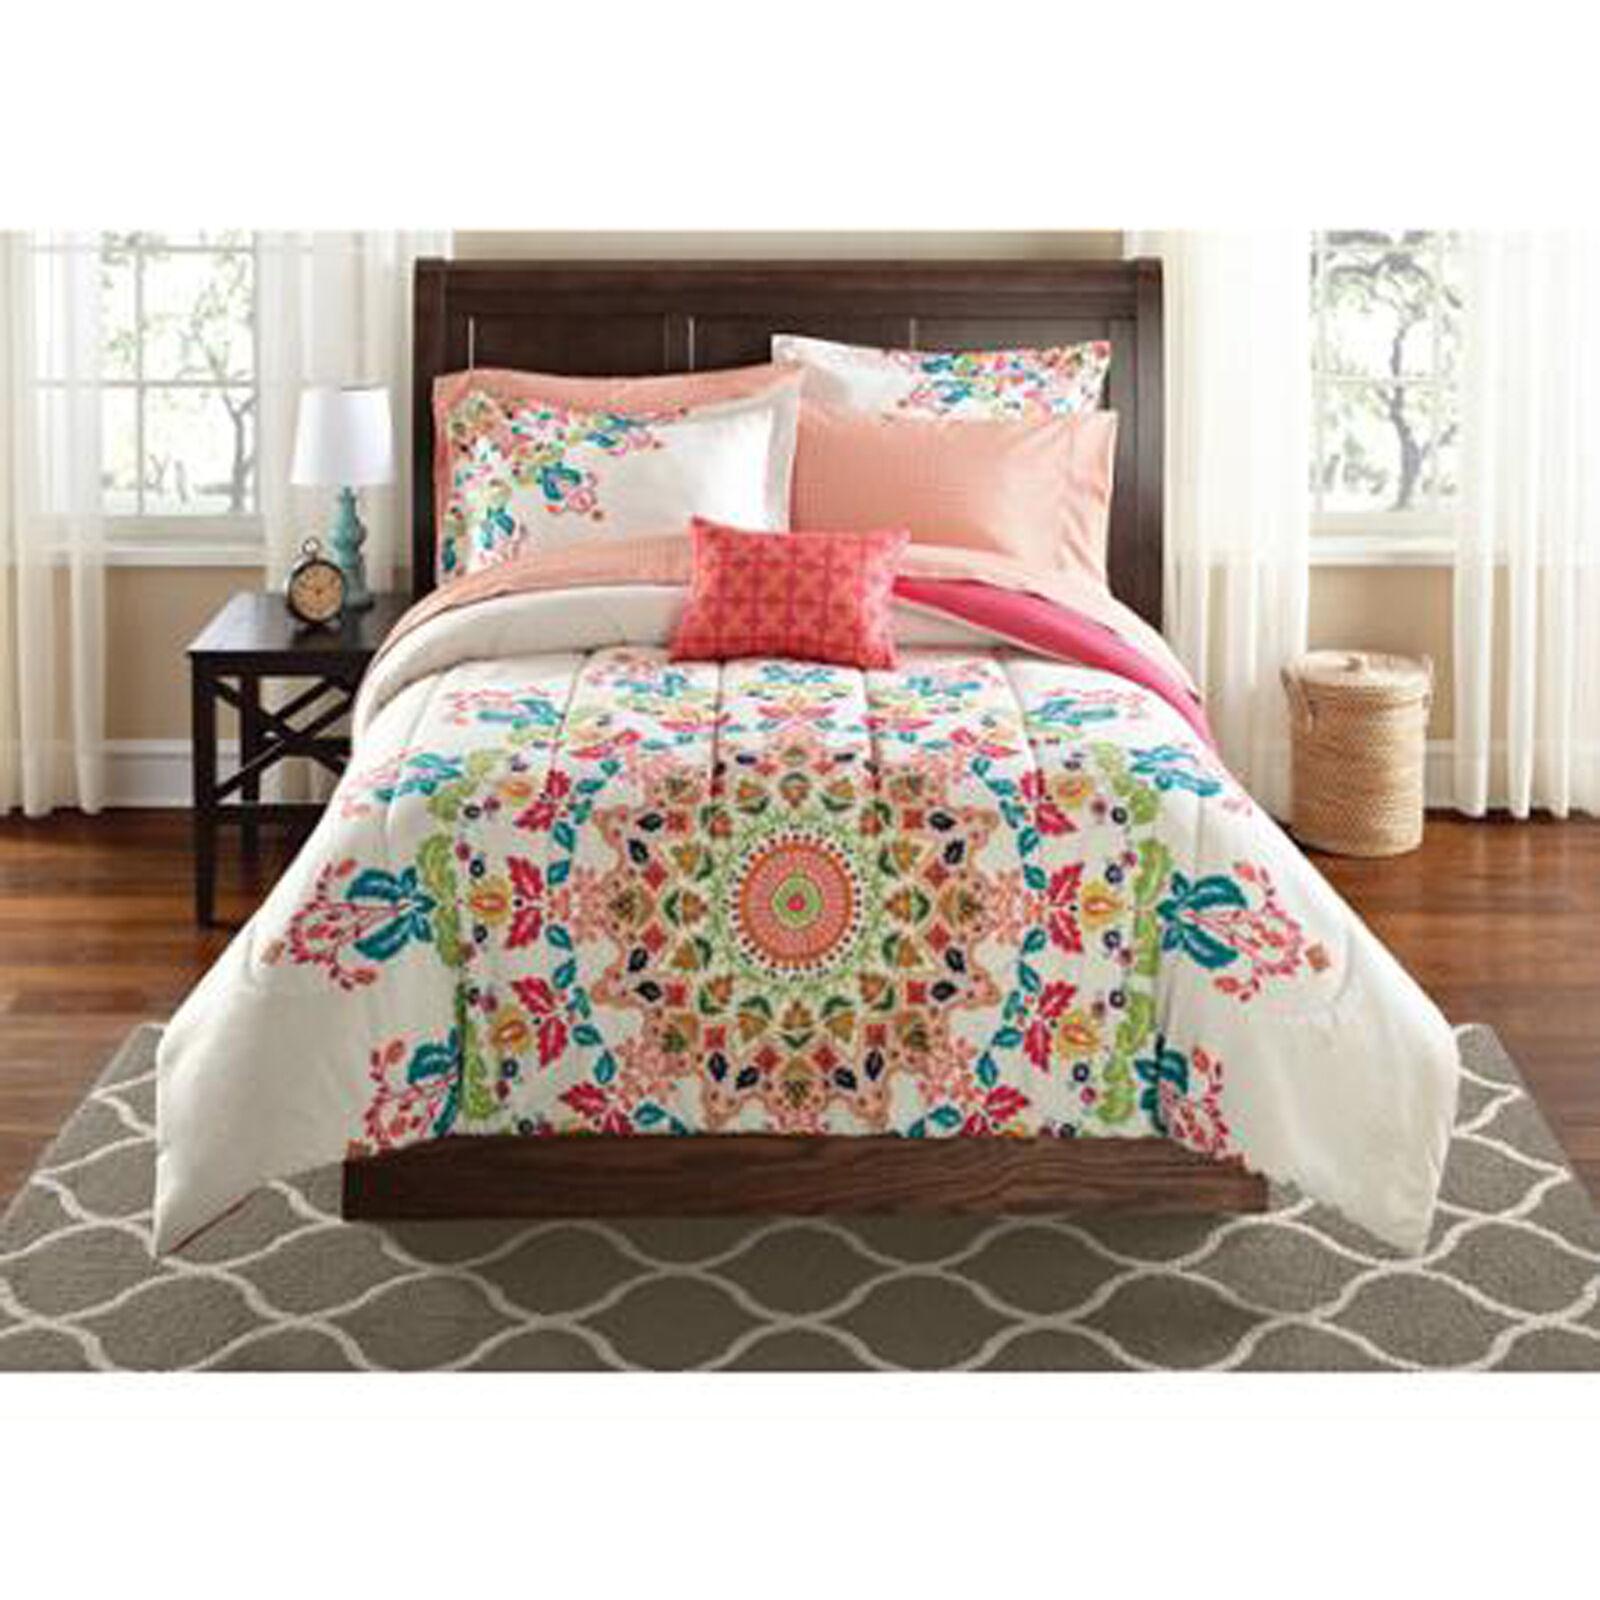 Full Bedding Comforter Set Sheets Bed In A Bag Polyester Complete